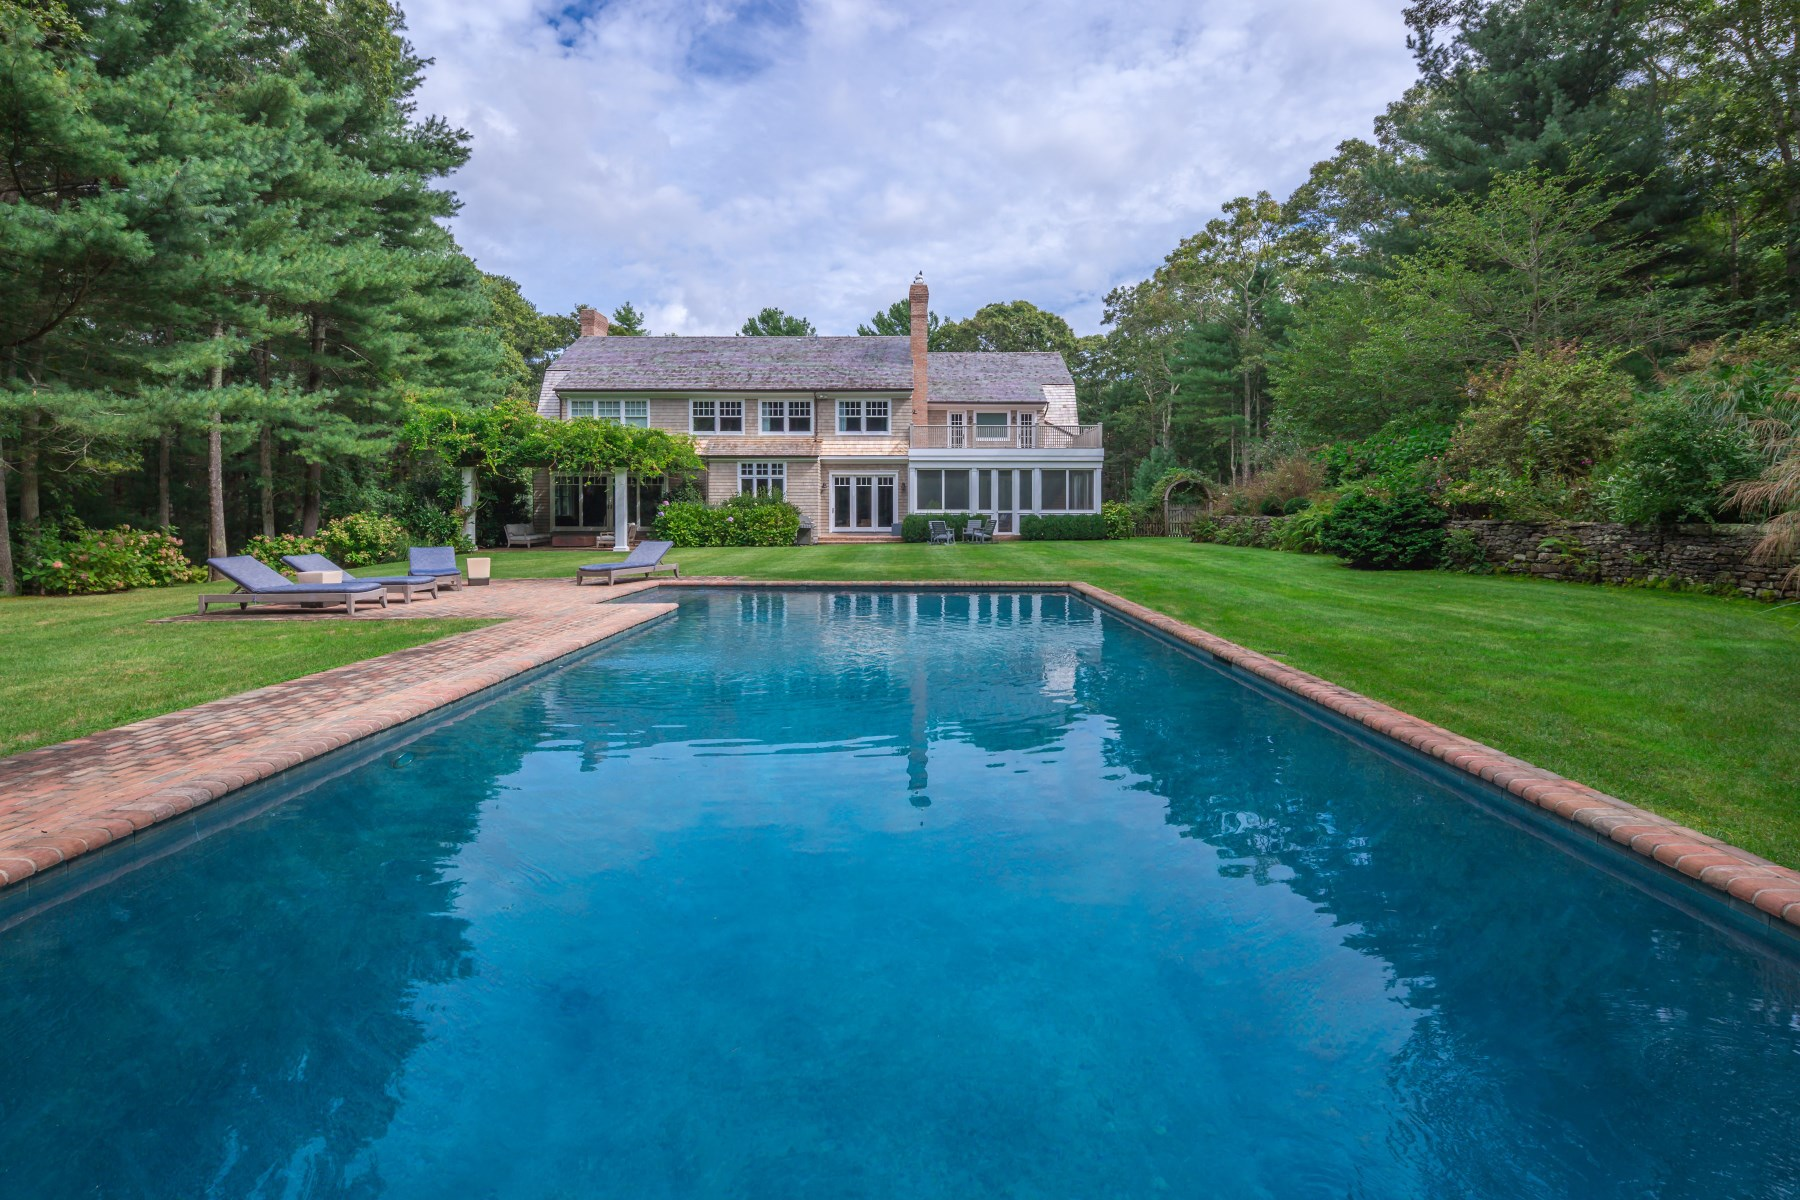 Single Family Home for Rent at Prestigious Bull Run 23 Bull Run East Hampton, New York 11937 United States